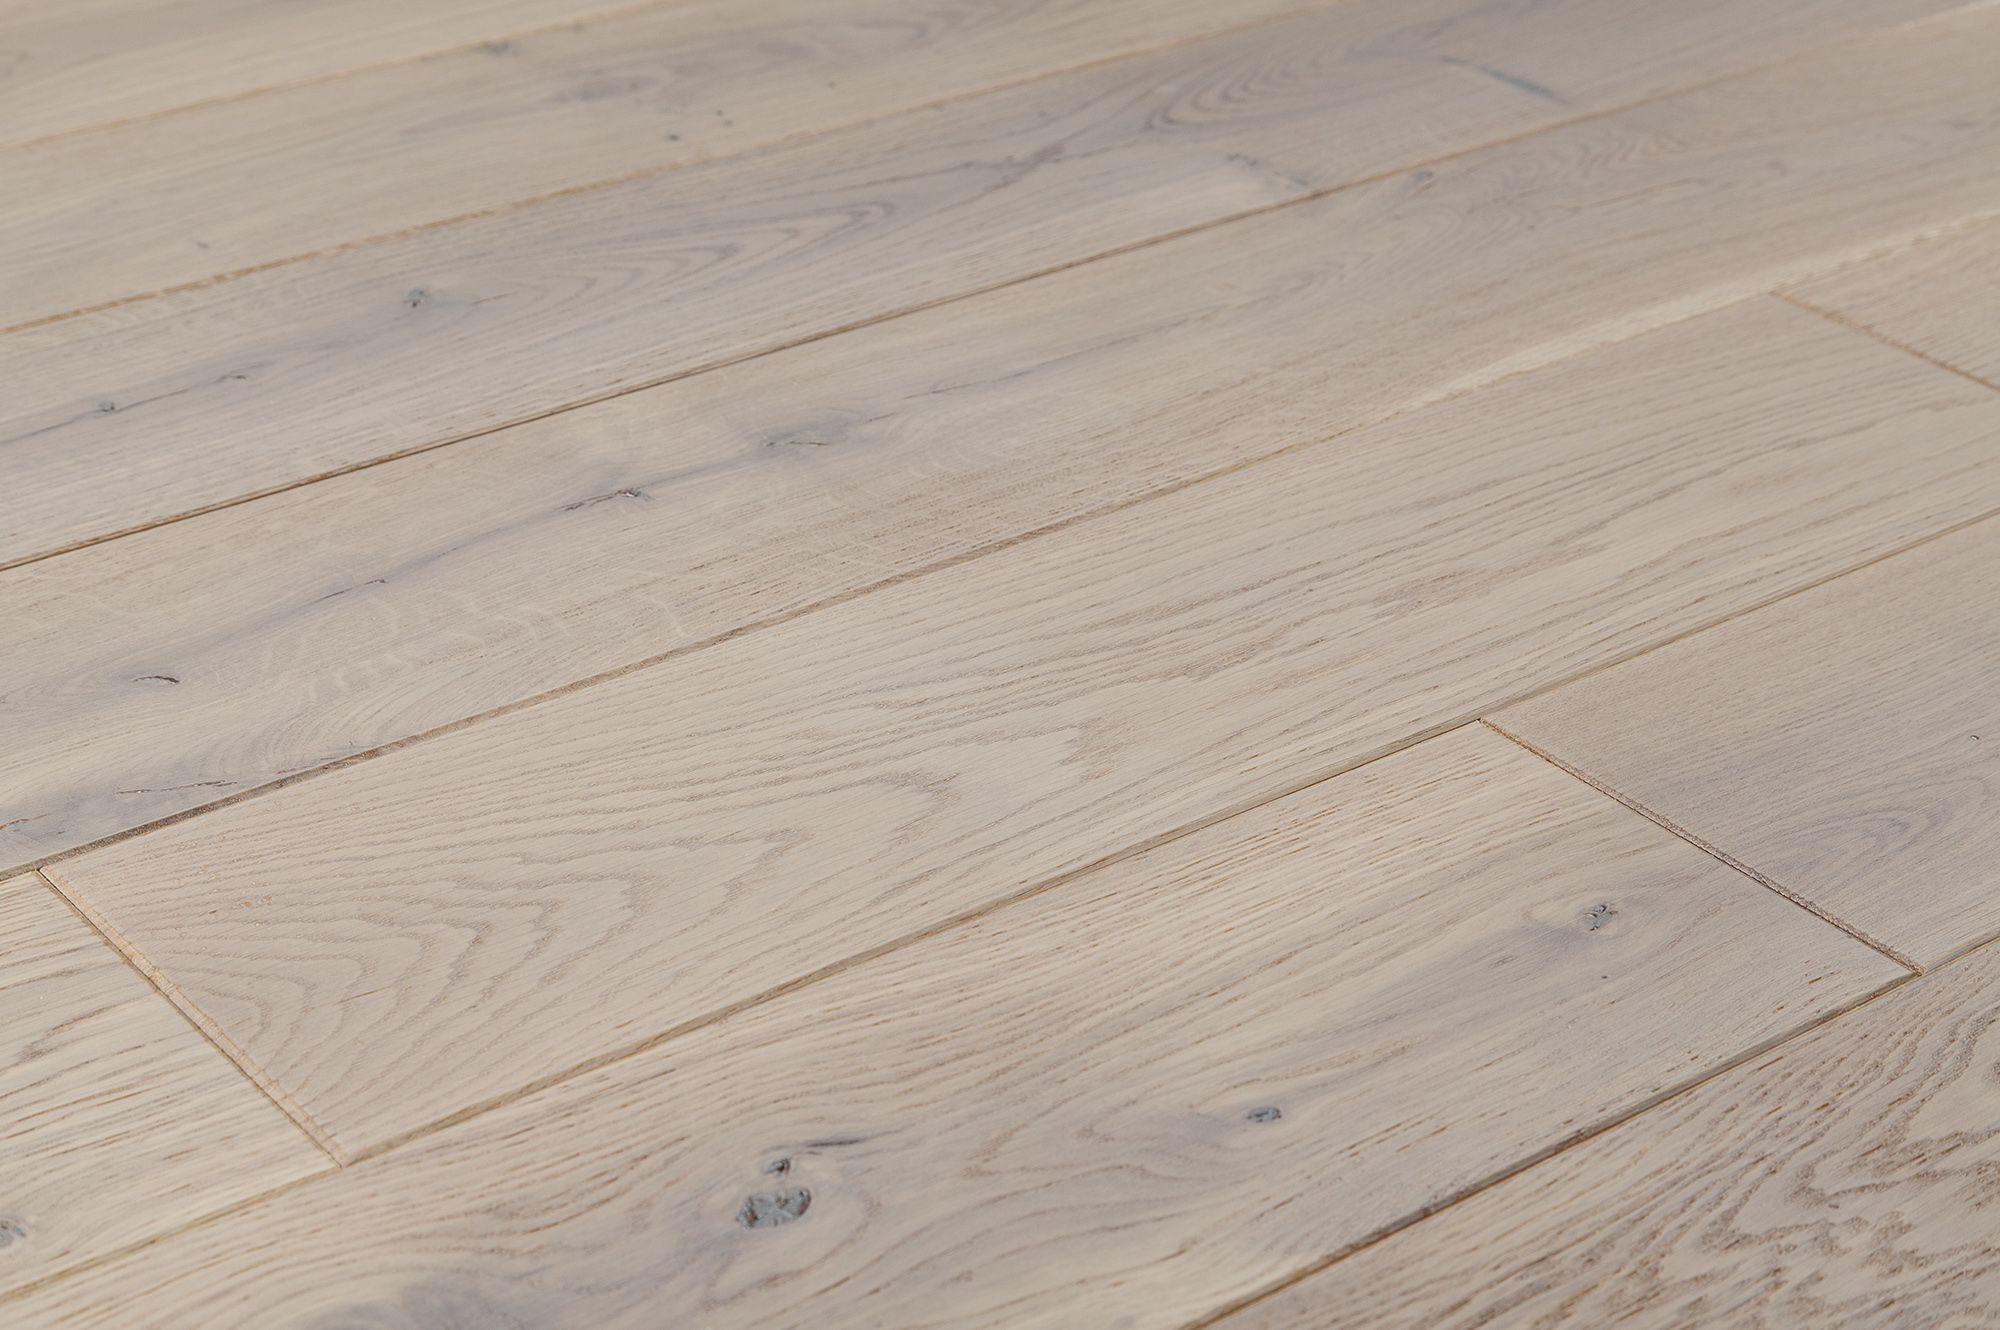 Builddirect Jasper Jasper Hardwood European Brushed Oak Collection Flooring Hardwood Hardwood Floors